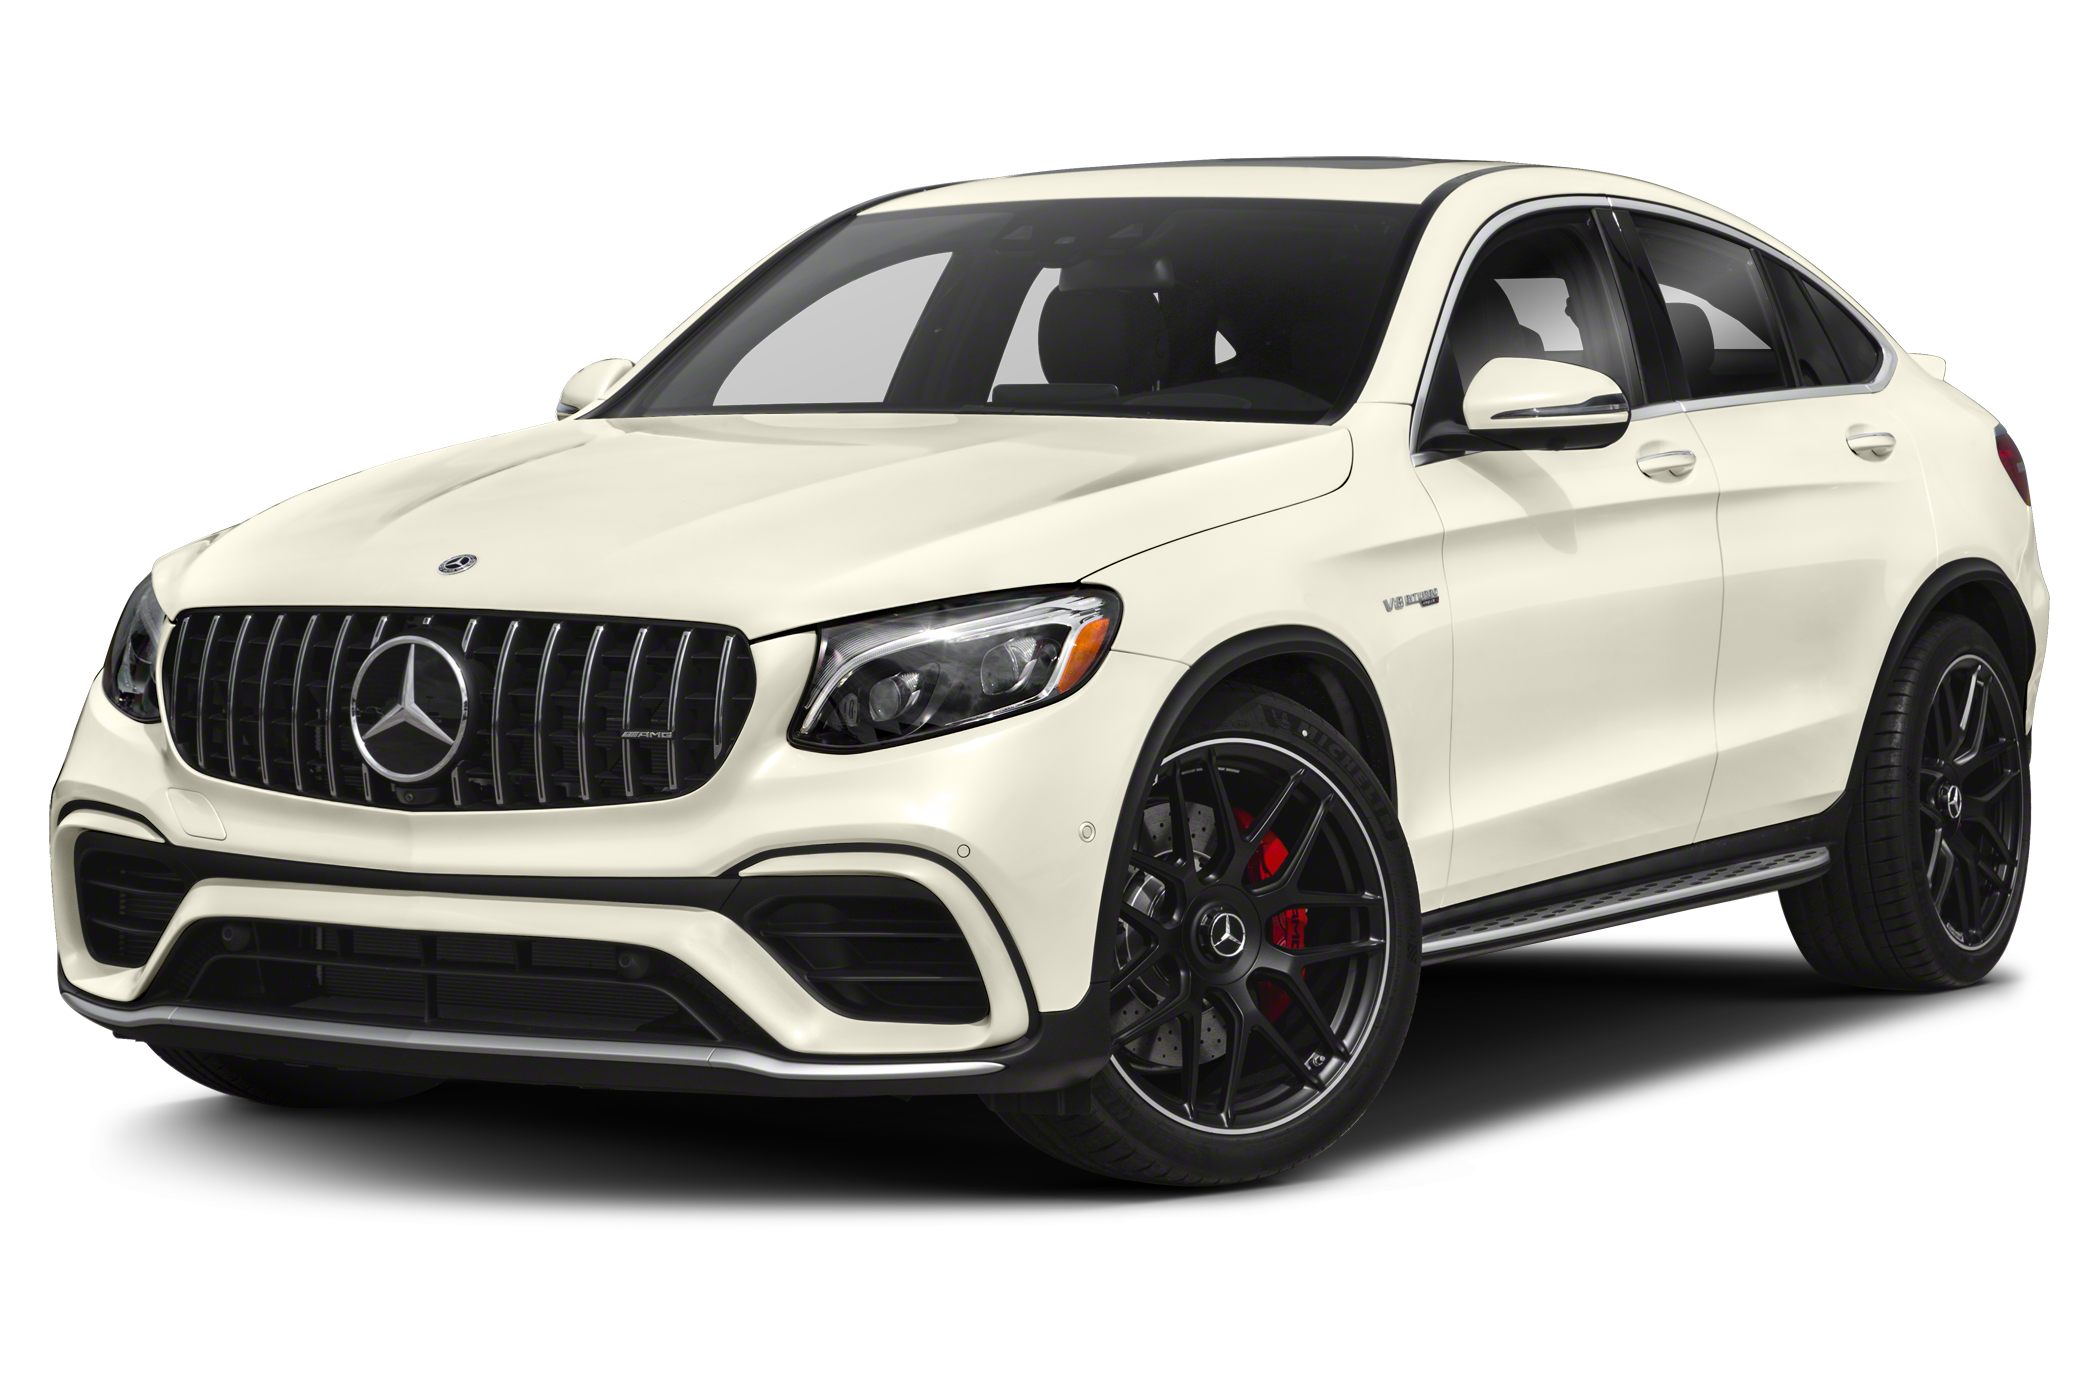 2019 Mercedes Benz AMG GLC 63 S AMG GLC 63 Coupe 4dr All wheel Drive